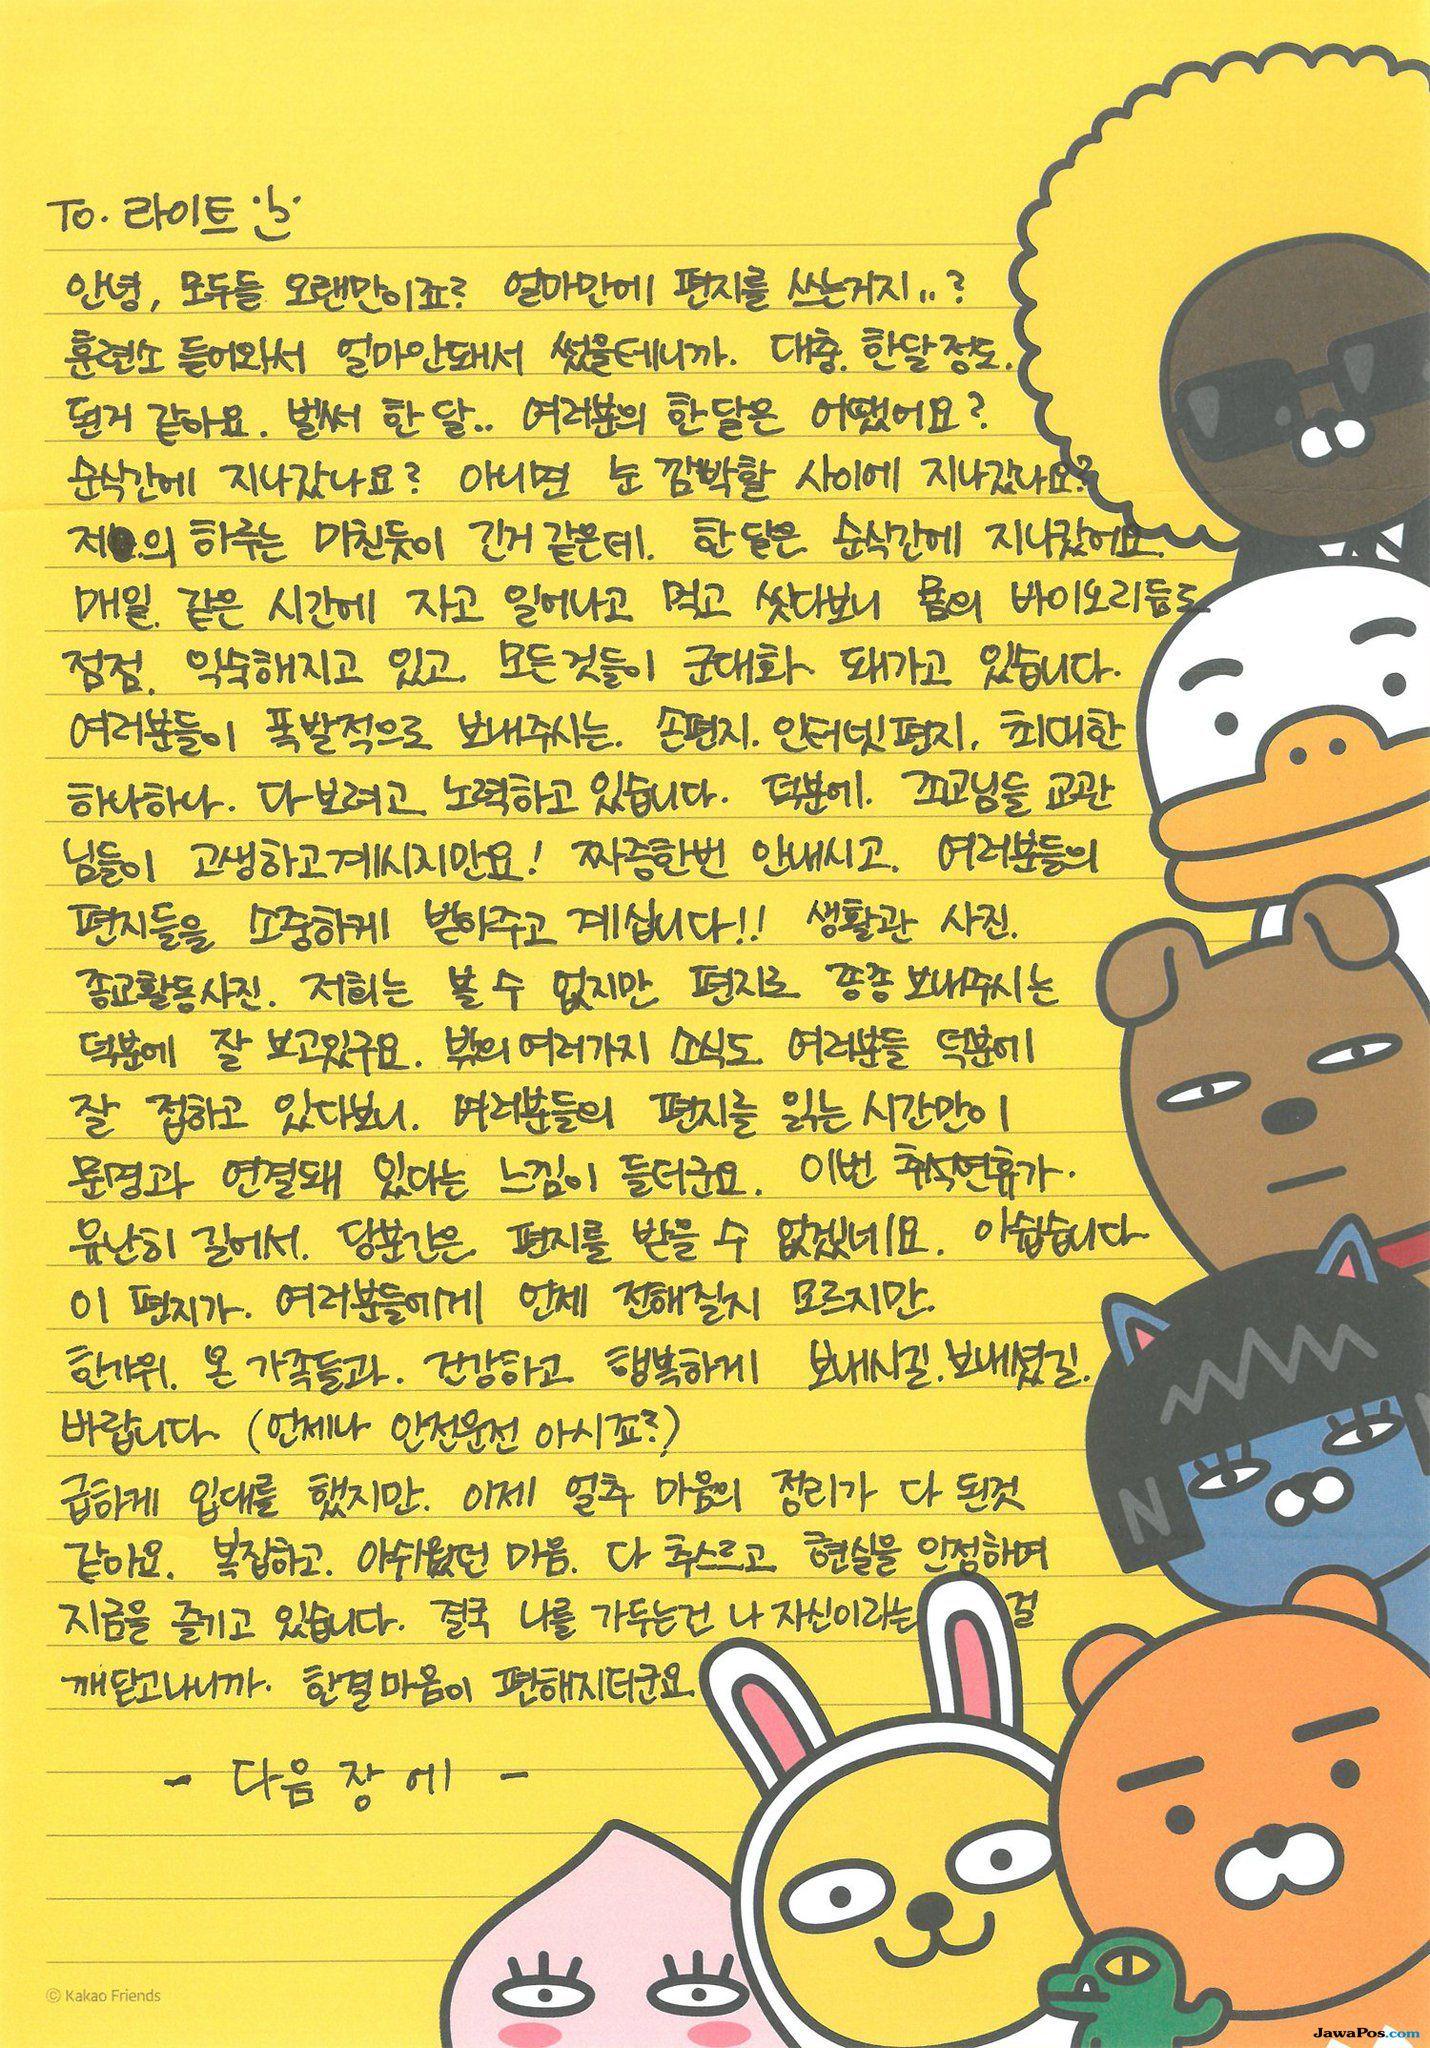 Kirim Surat Dari Camp Militer, Doo Joon Highlight Curhat Kepada Fans